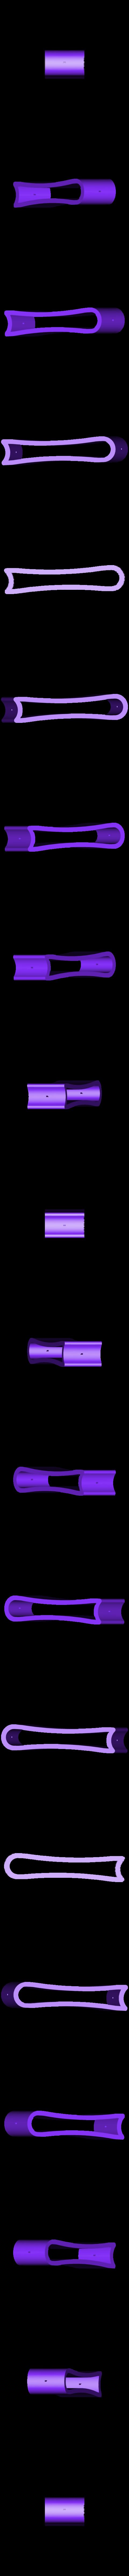 C5_X1.stl Download STL file Adjustable lamp - with vertebrae  • 3D printable object, Ciokobango